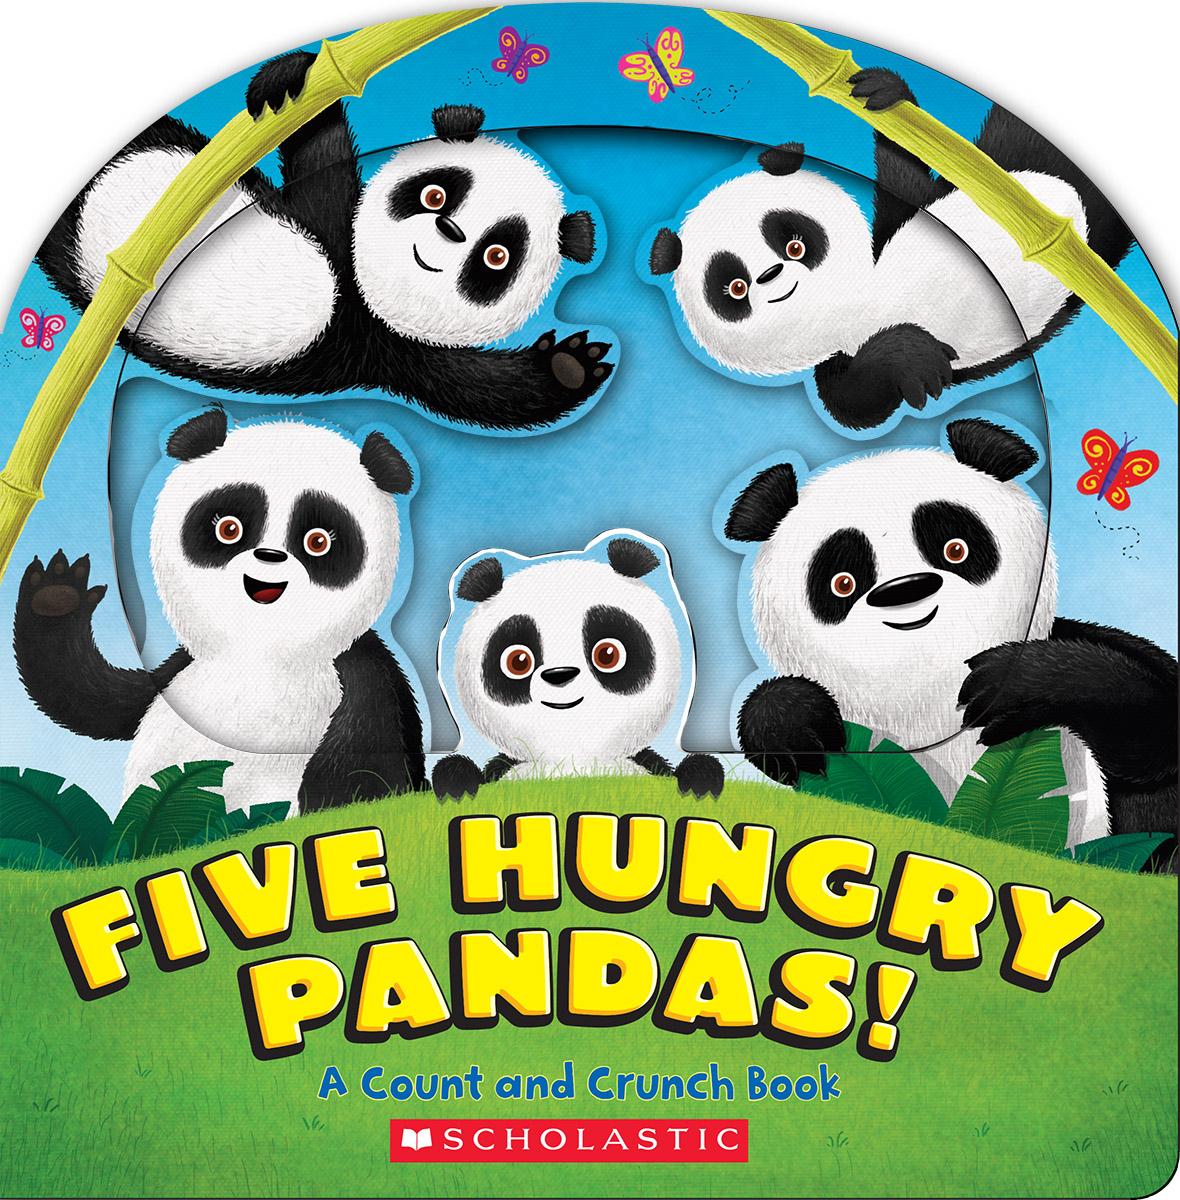 Five Hungry Pandas!